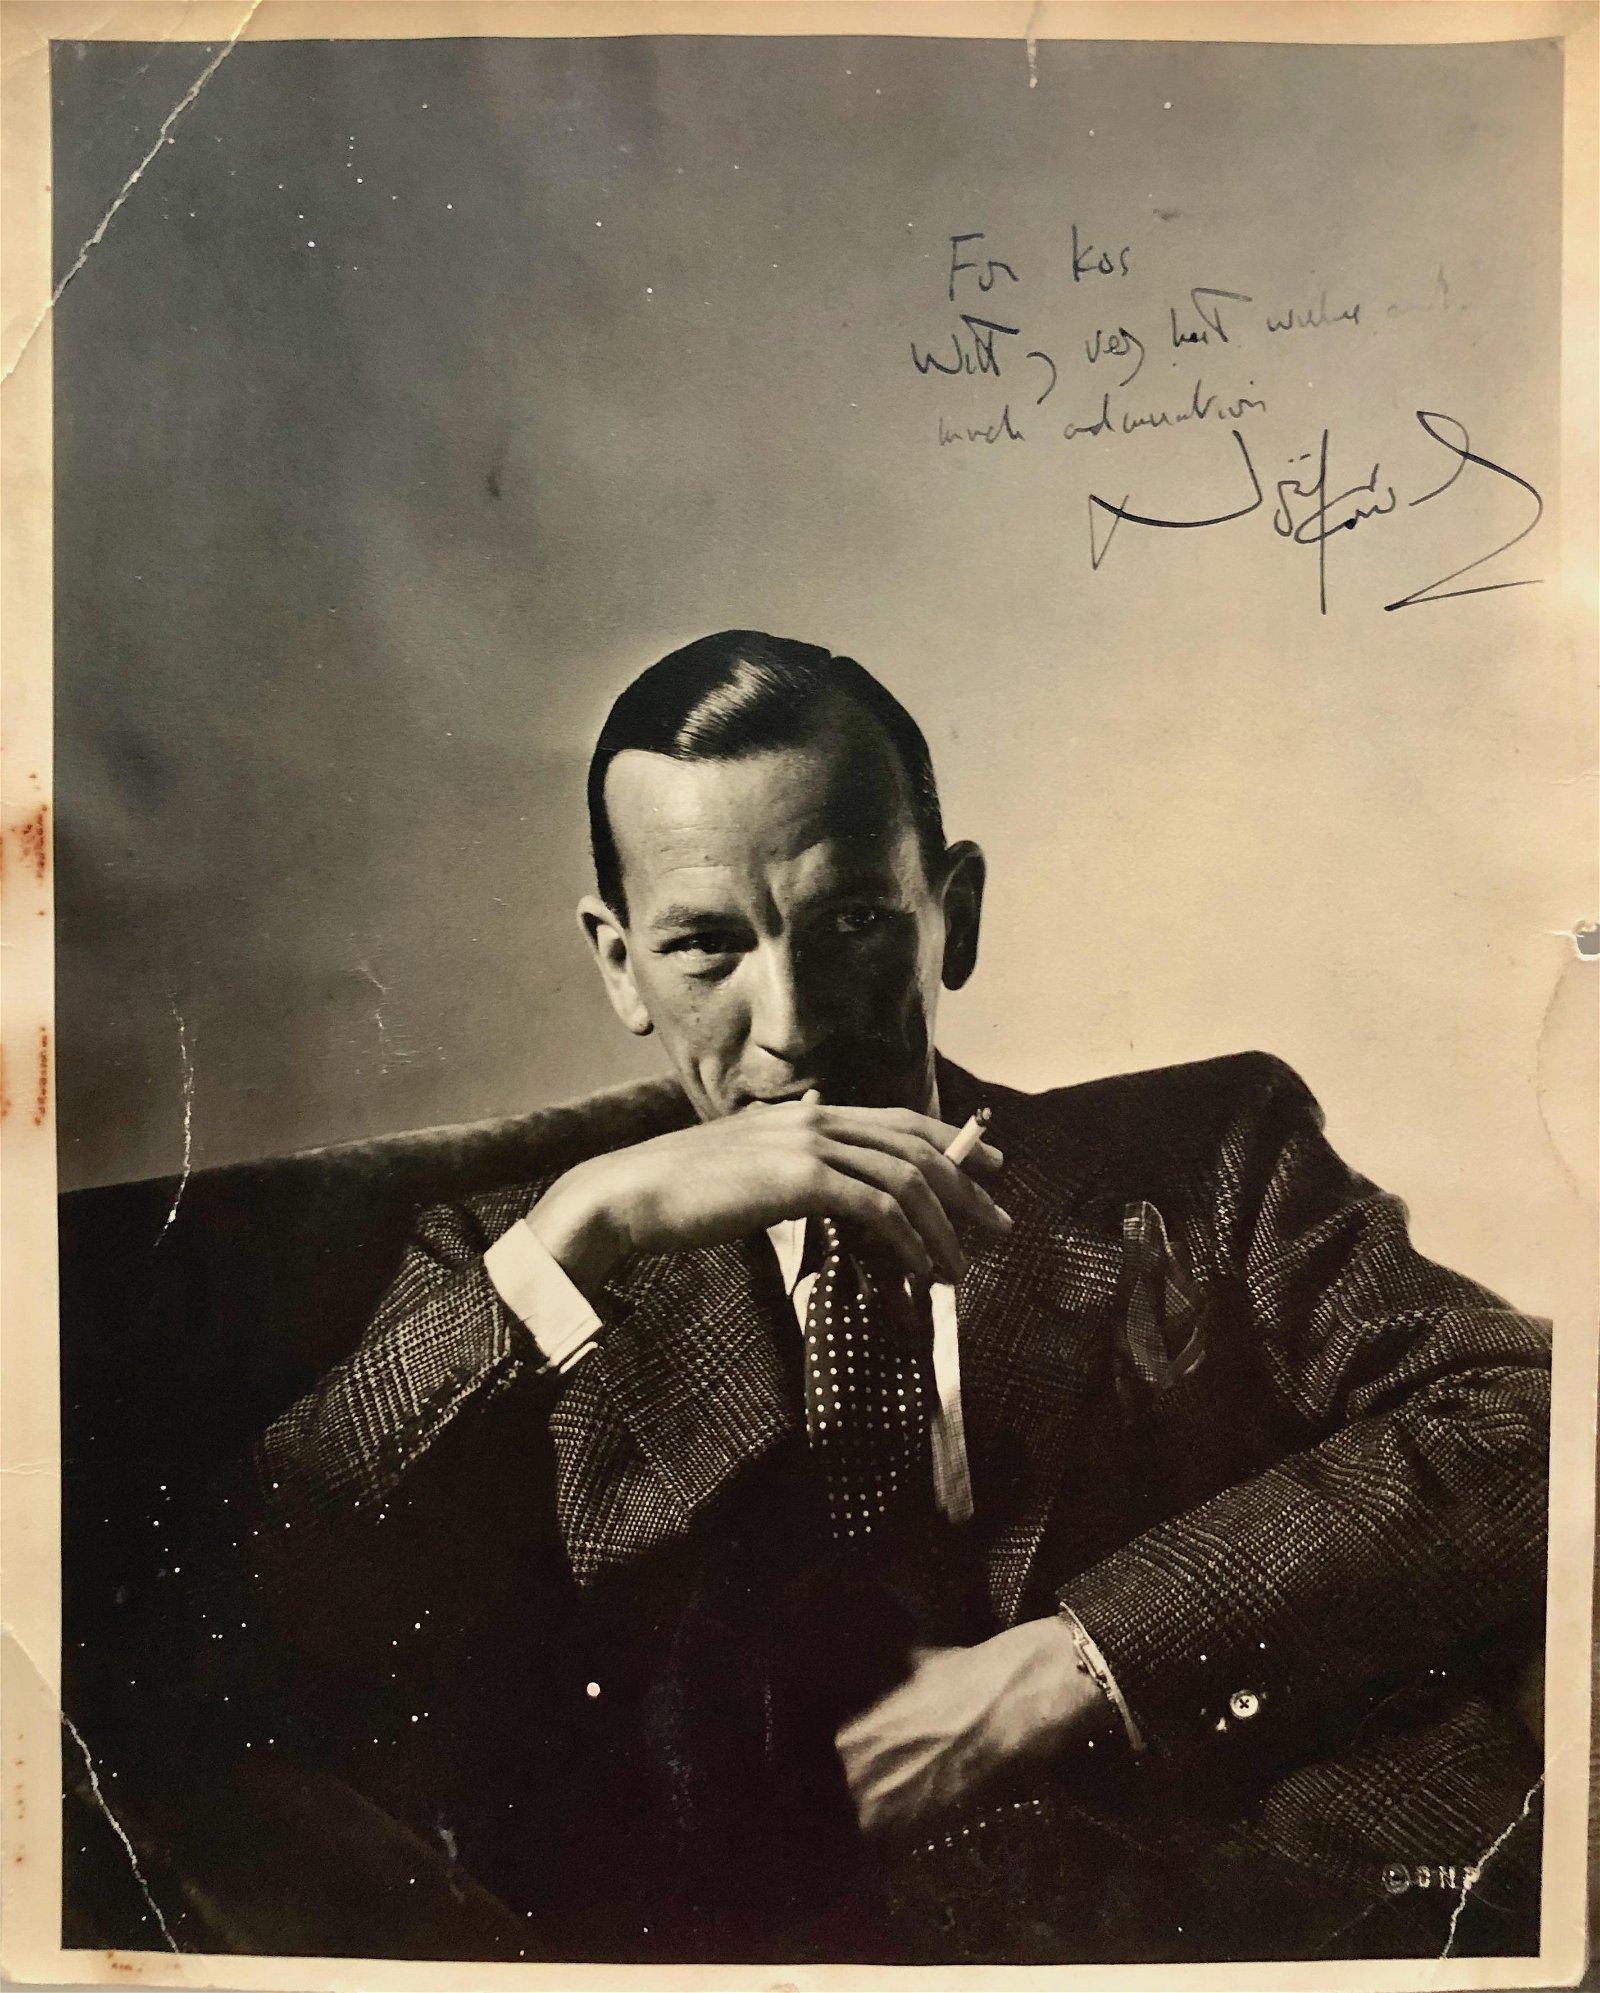 Horst P. Horst, Noel Coward Inscribed Photo, Paris 1936